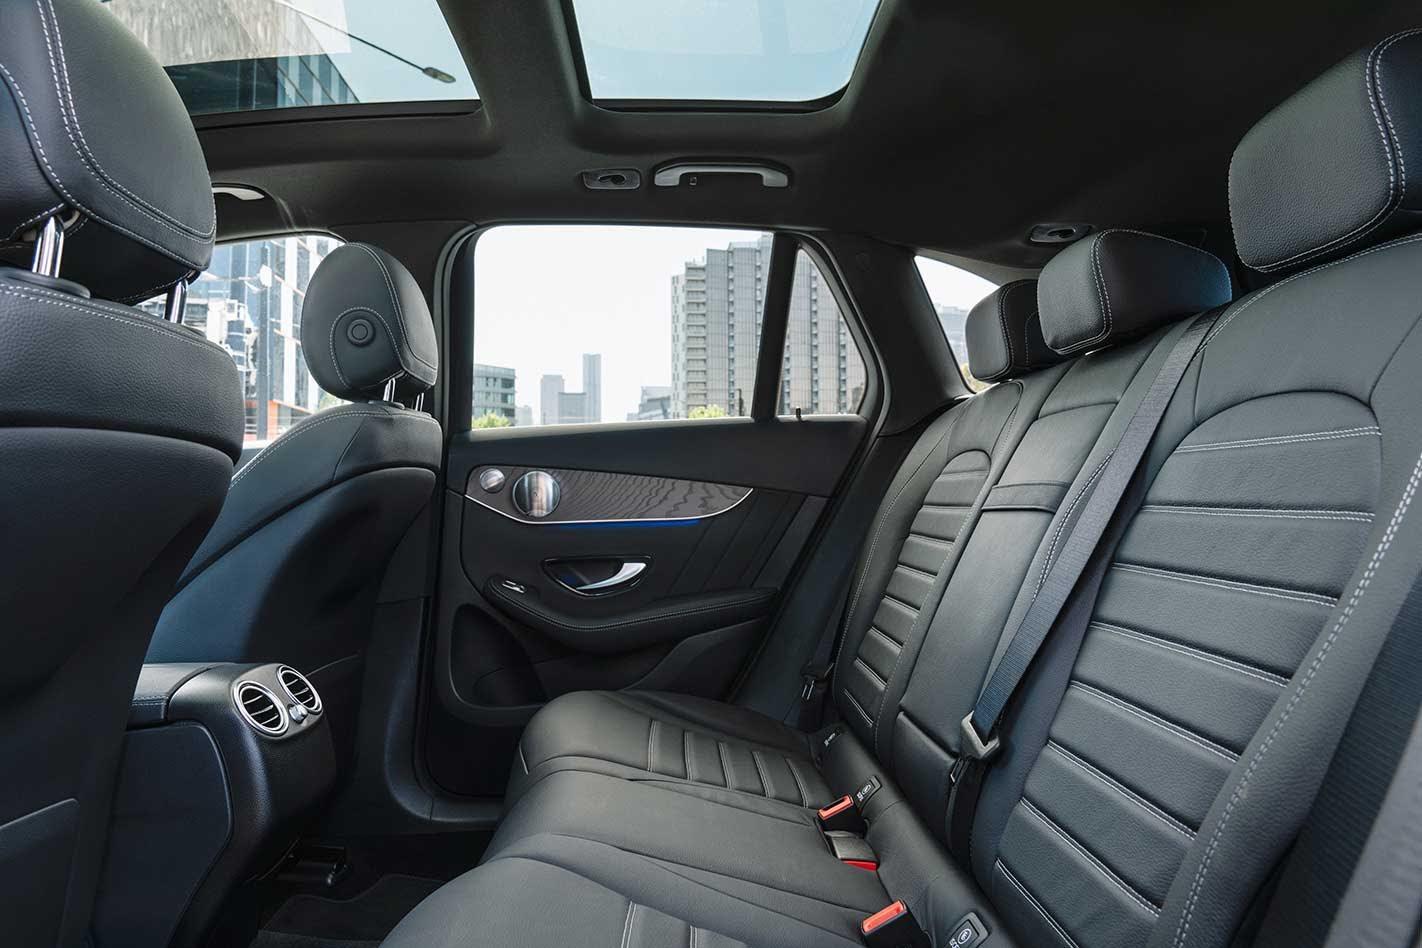 Mercedes-Benz GLC 300 review